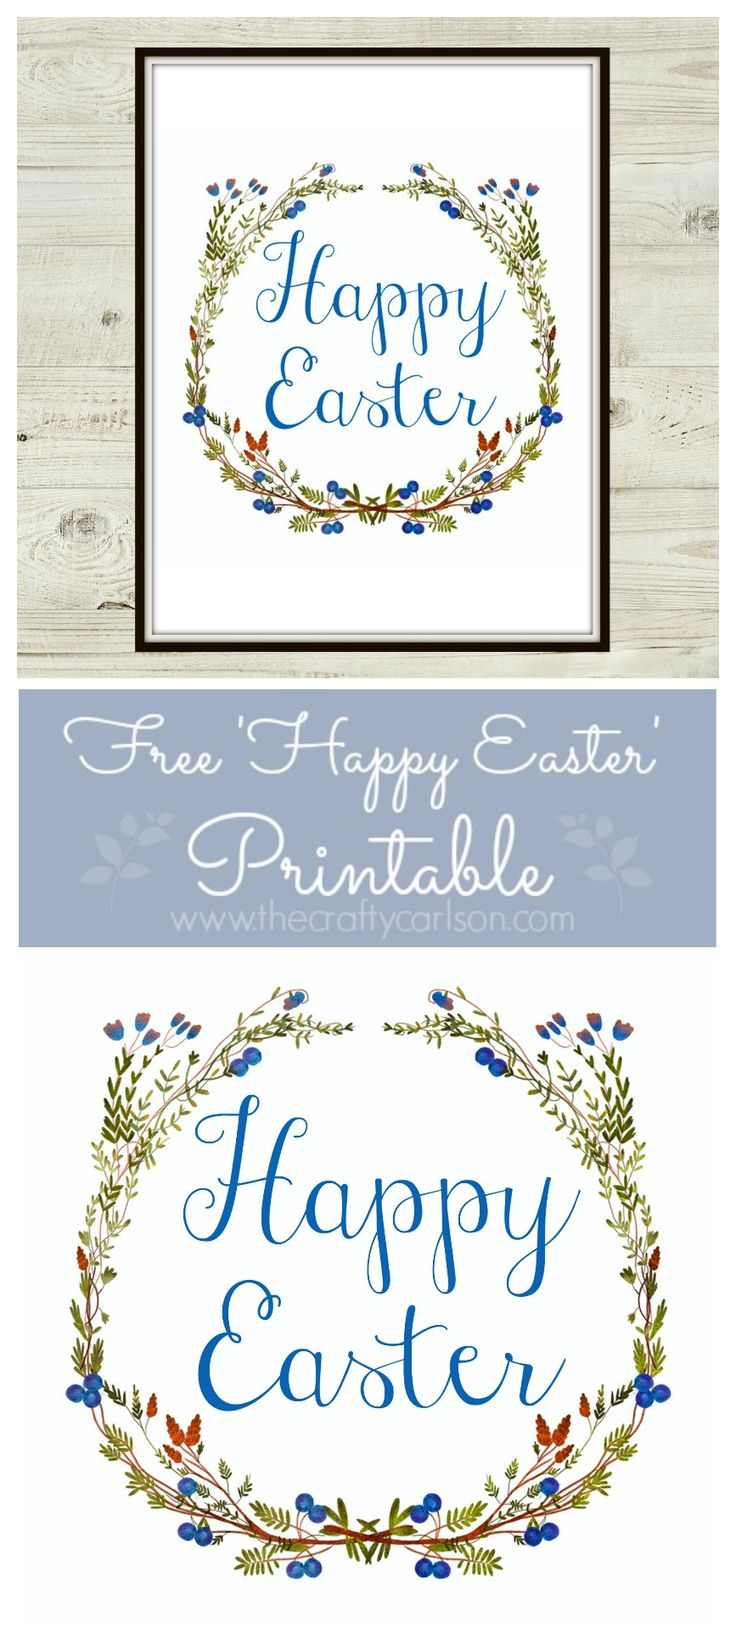 Free Happy Easter Printable